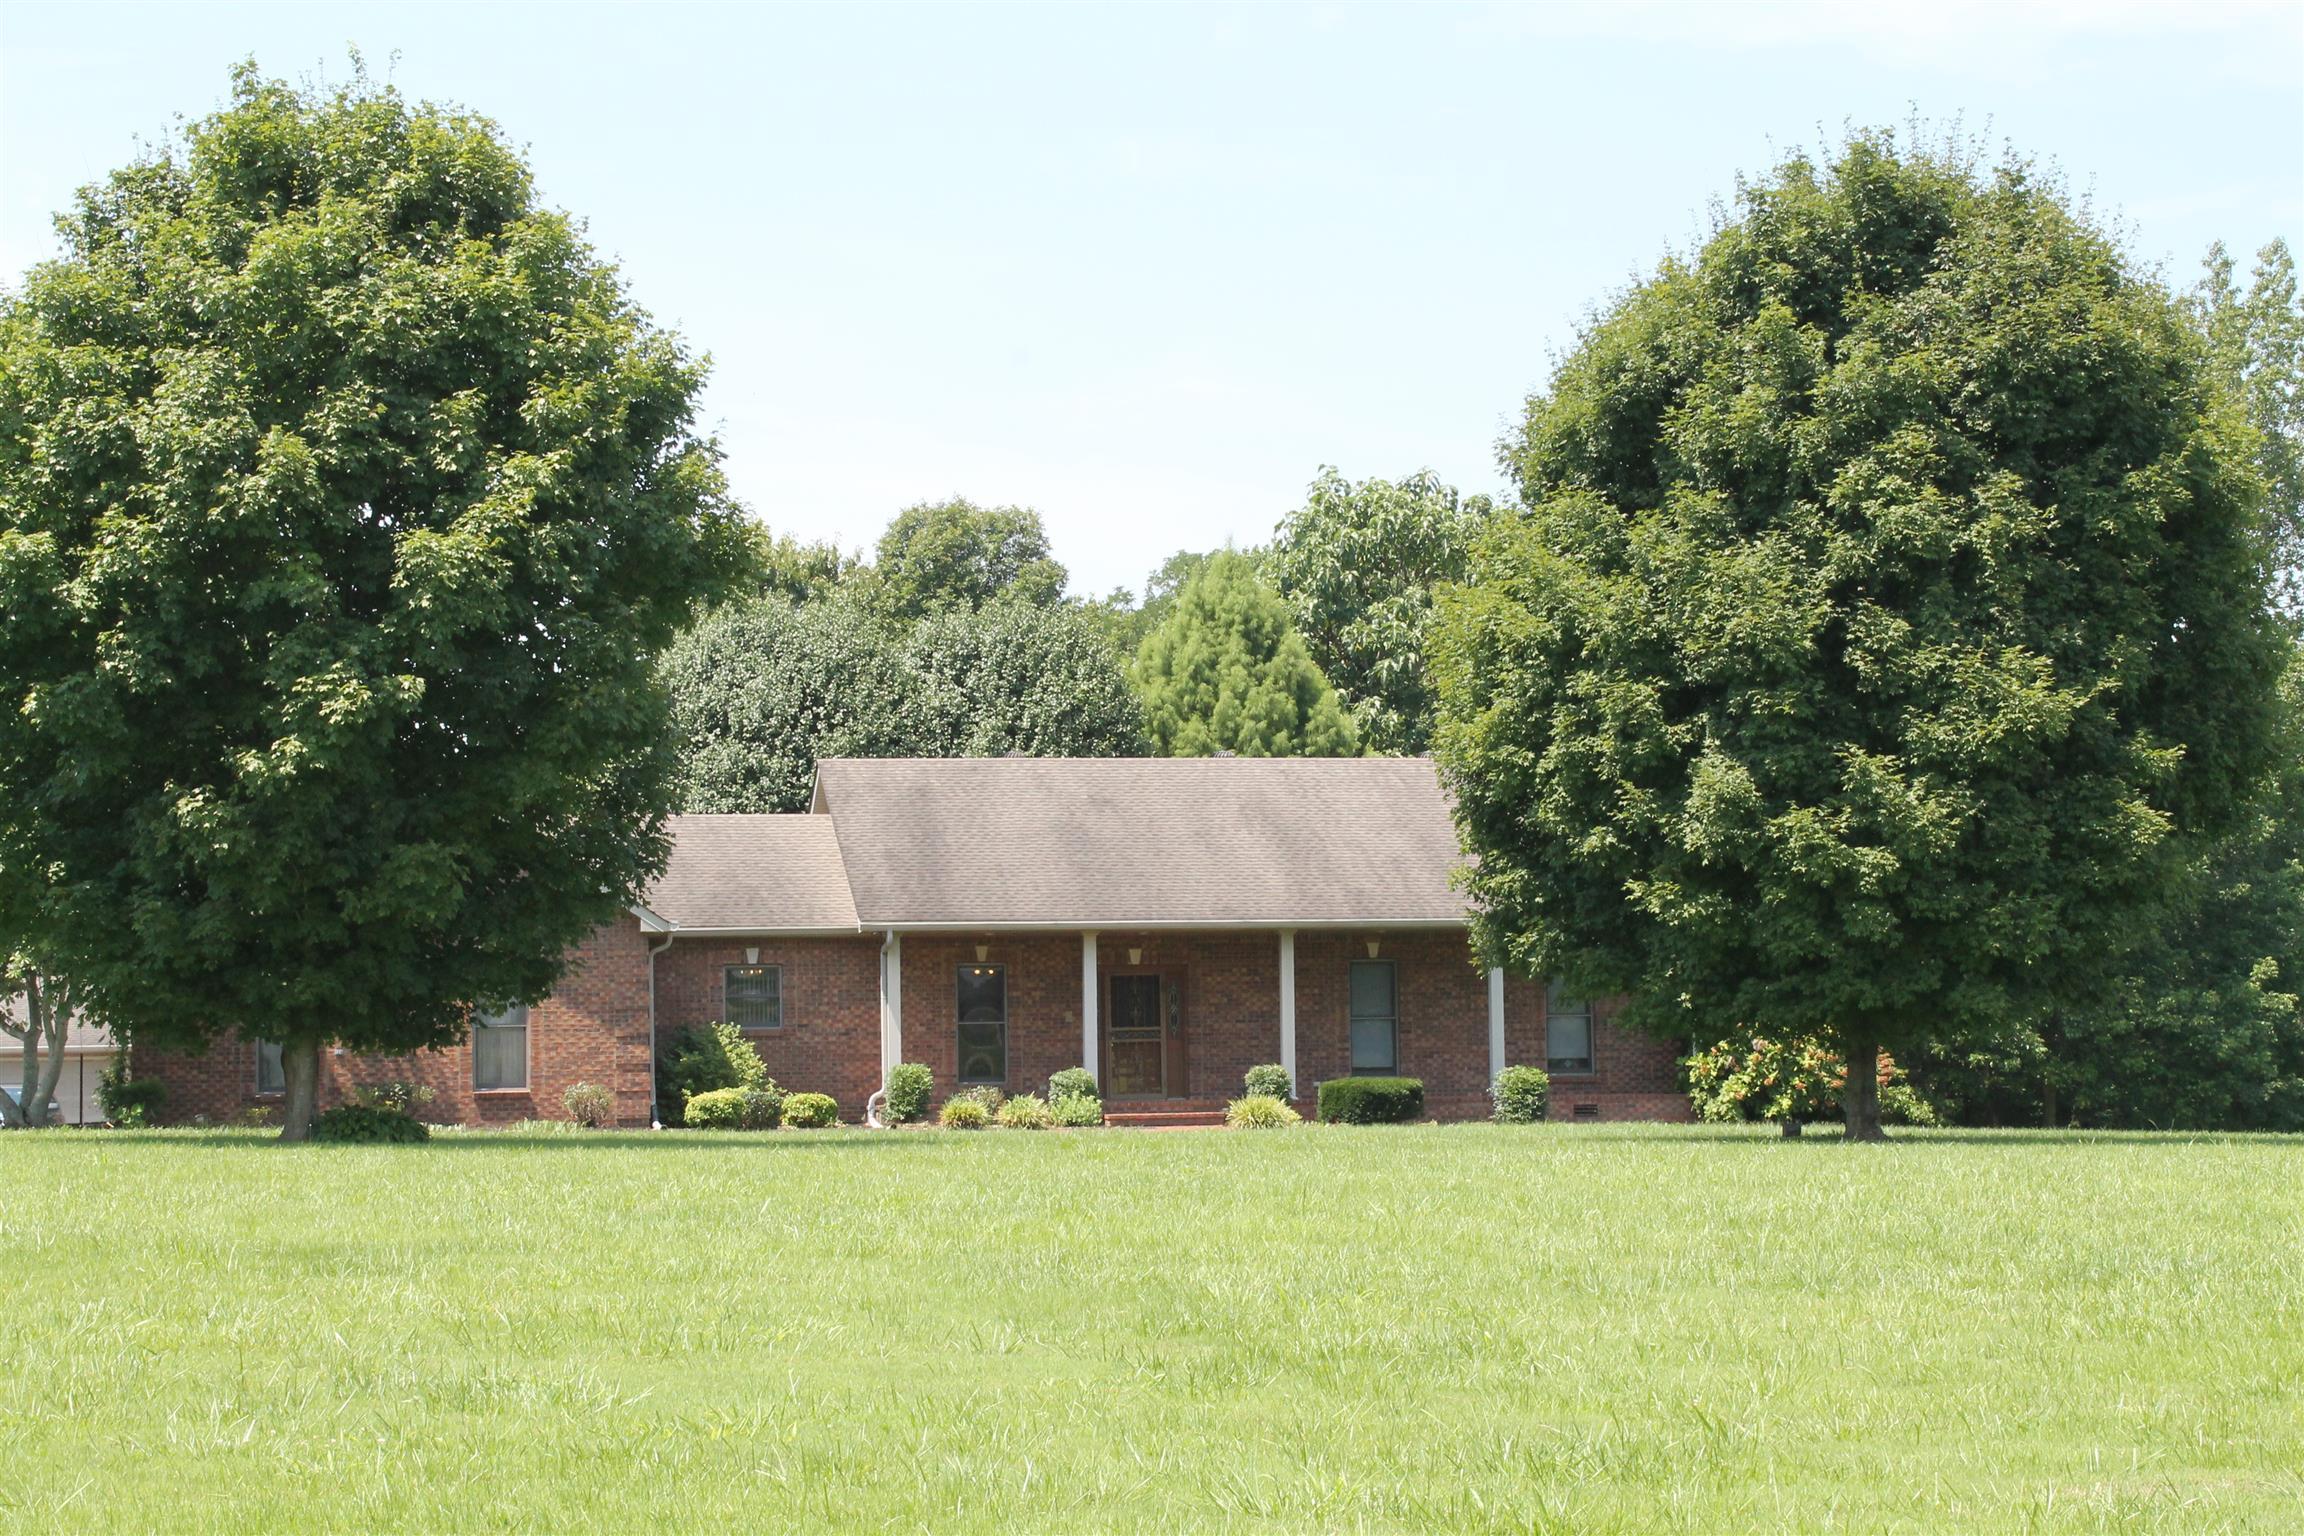 4180 Ashland City Rd, Clarksville, TN 37043 - Clarksville, TN real estate listing